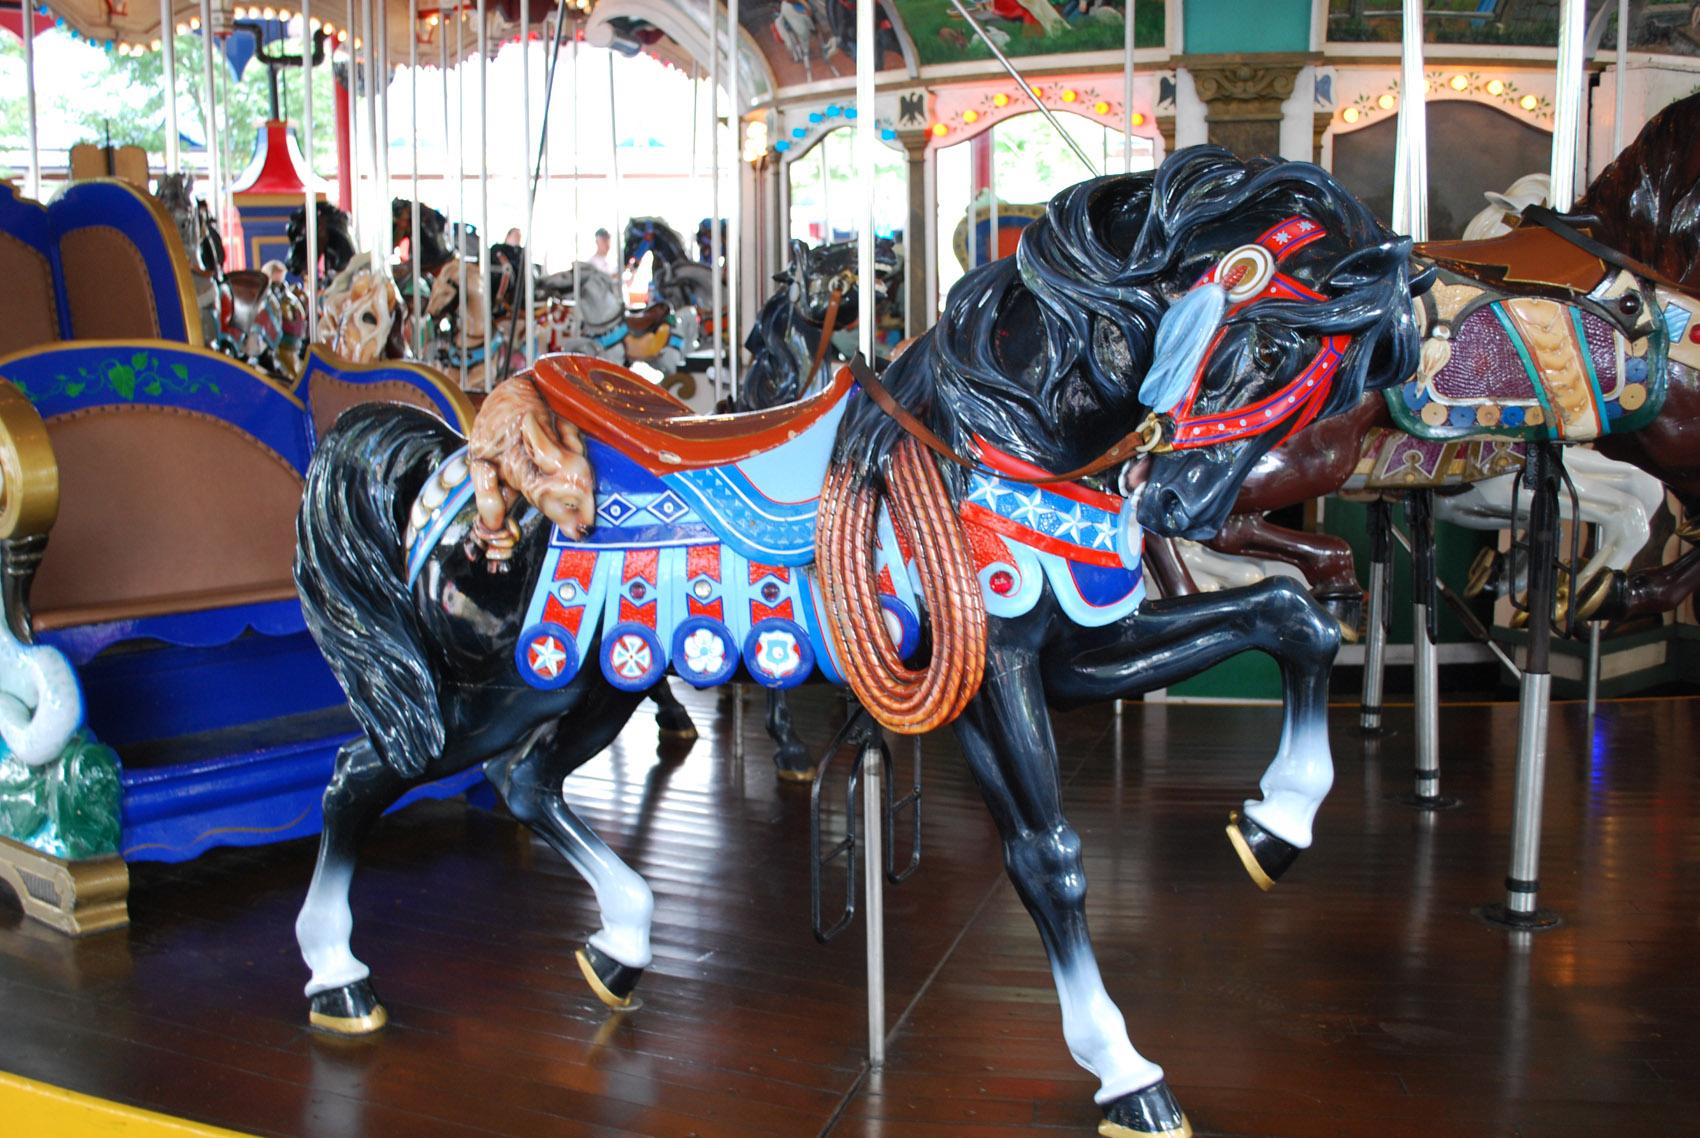 Historic-1919-Hersheypark-PTC-47-carousel-horse-0298